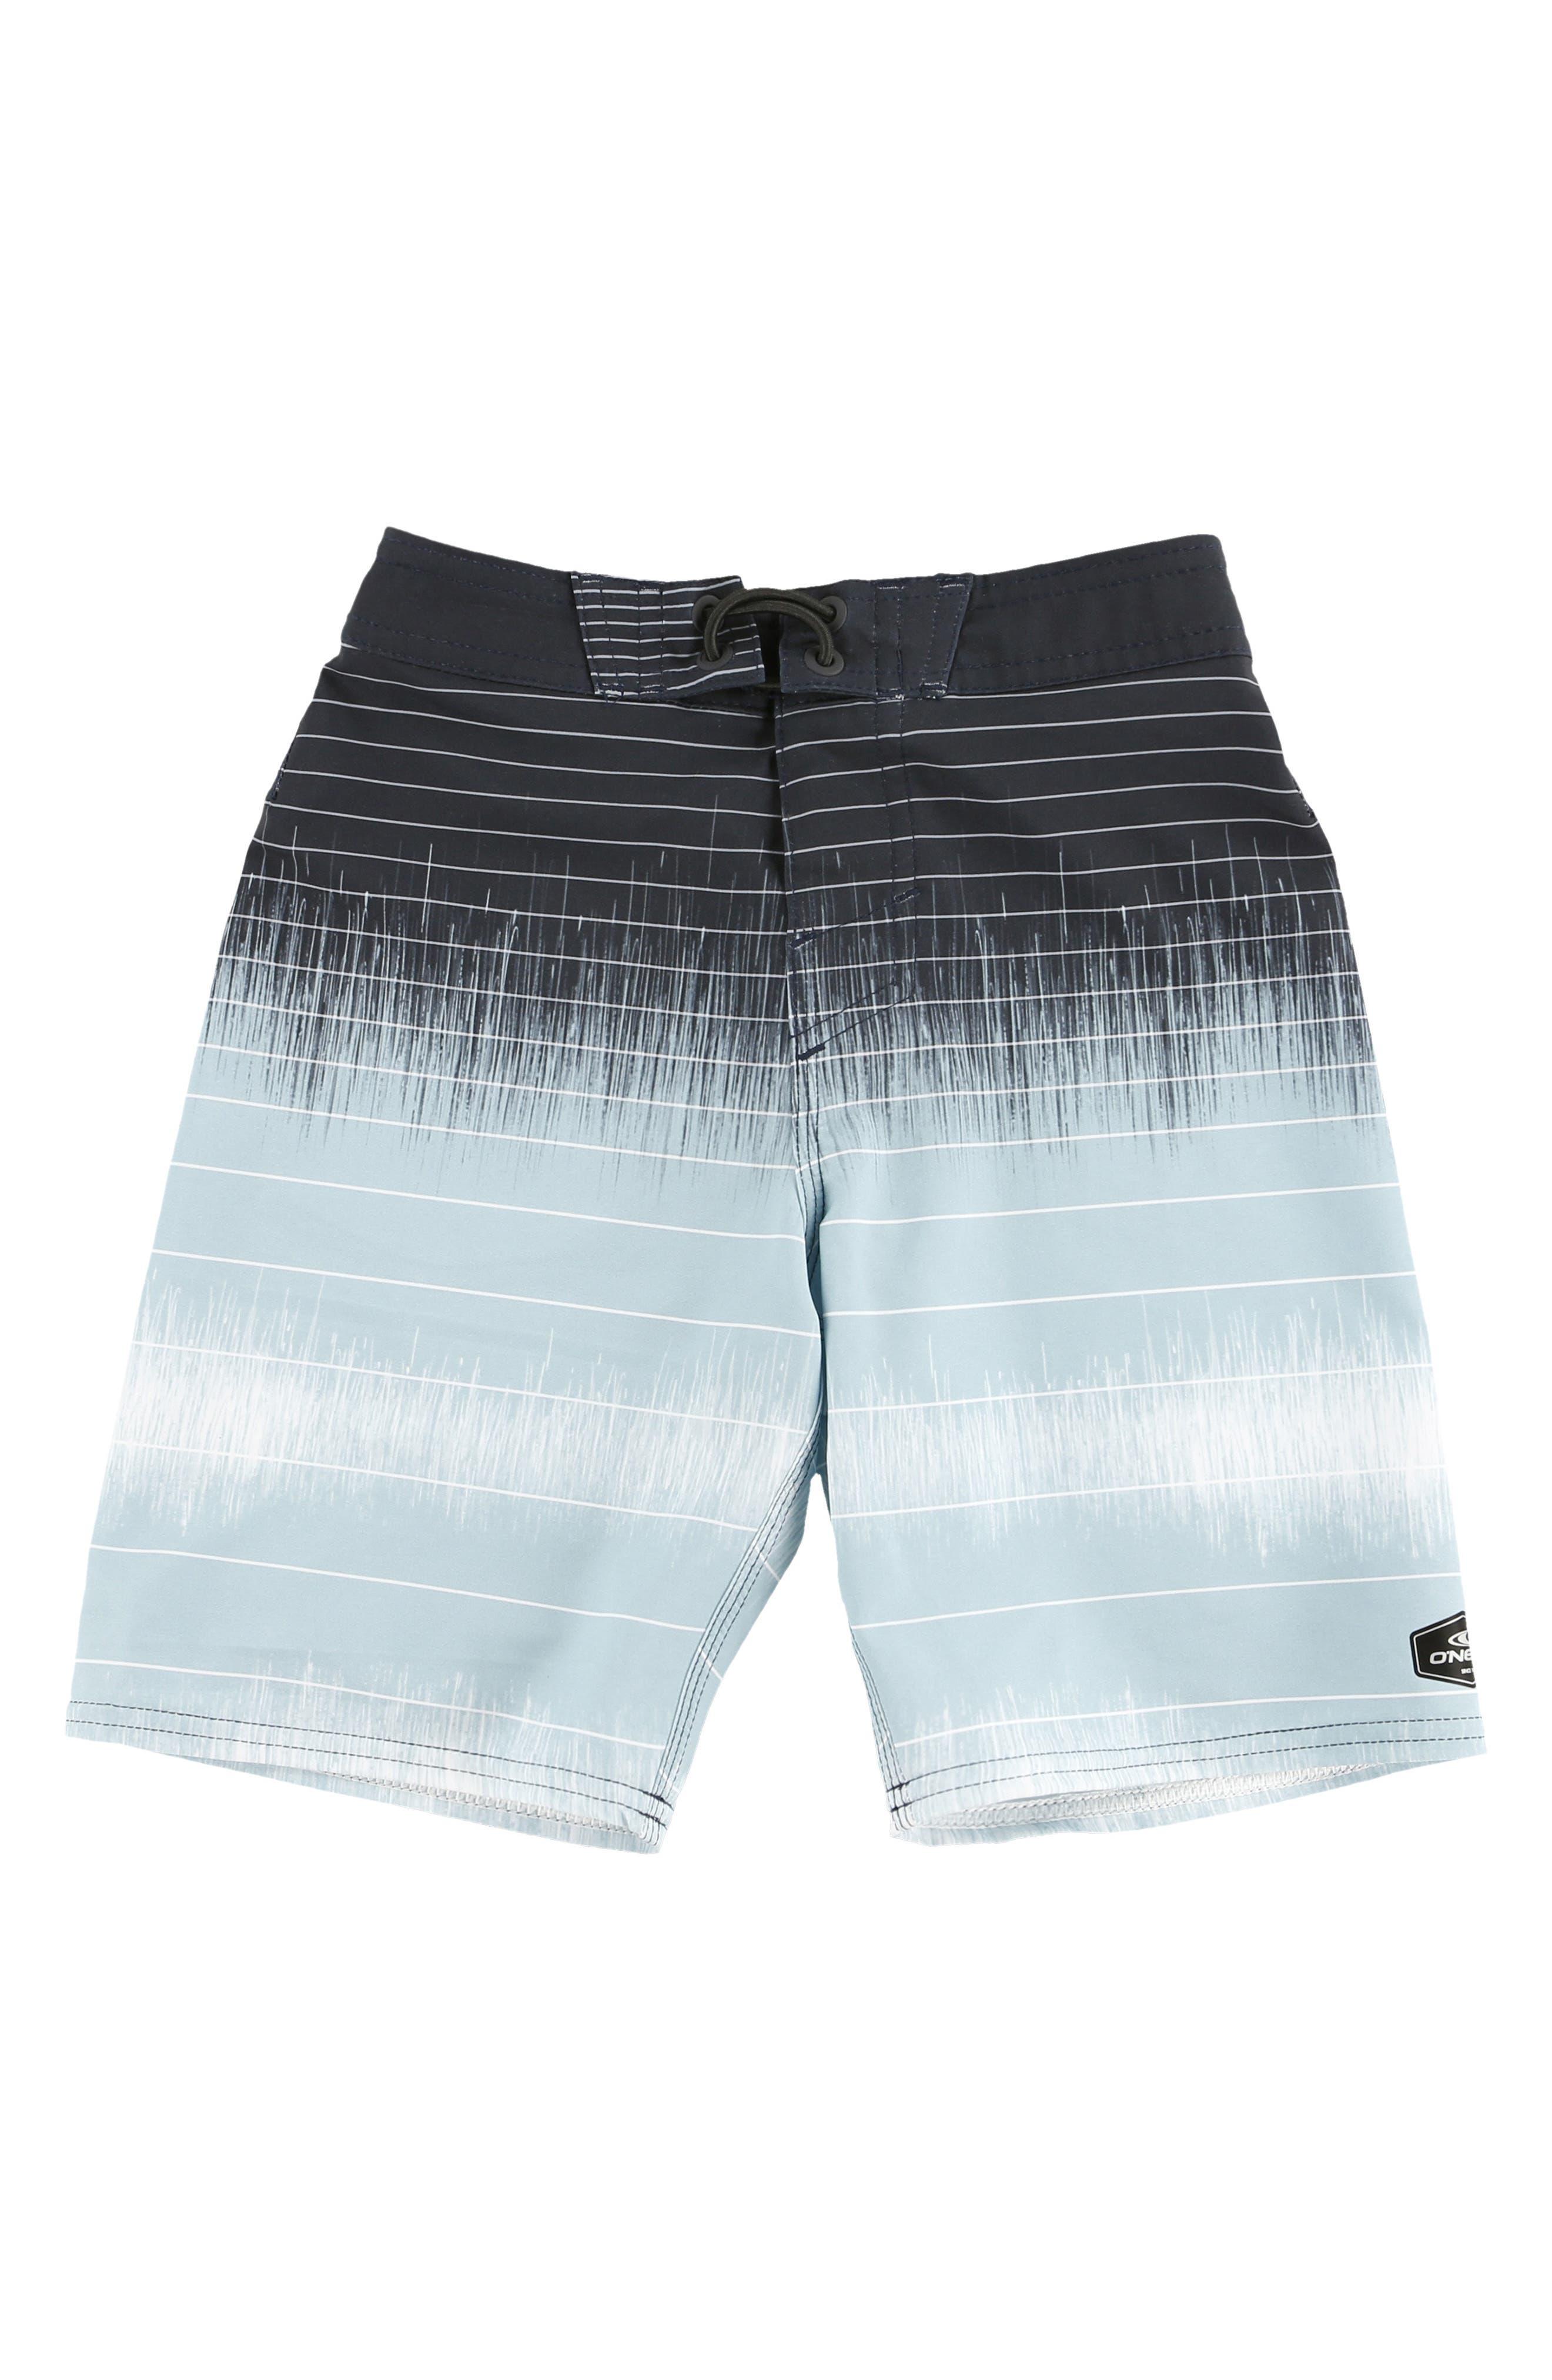 Hyperfreak Seismic Board Shorts,                         Main,                         color, 400